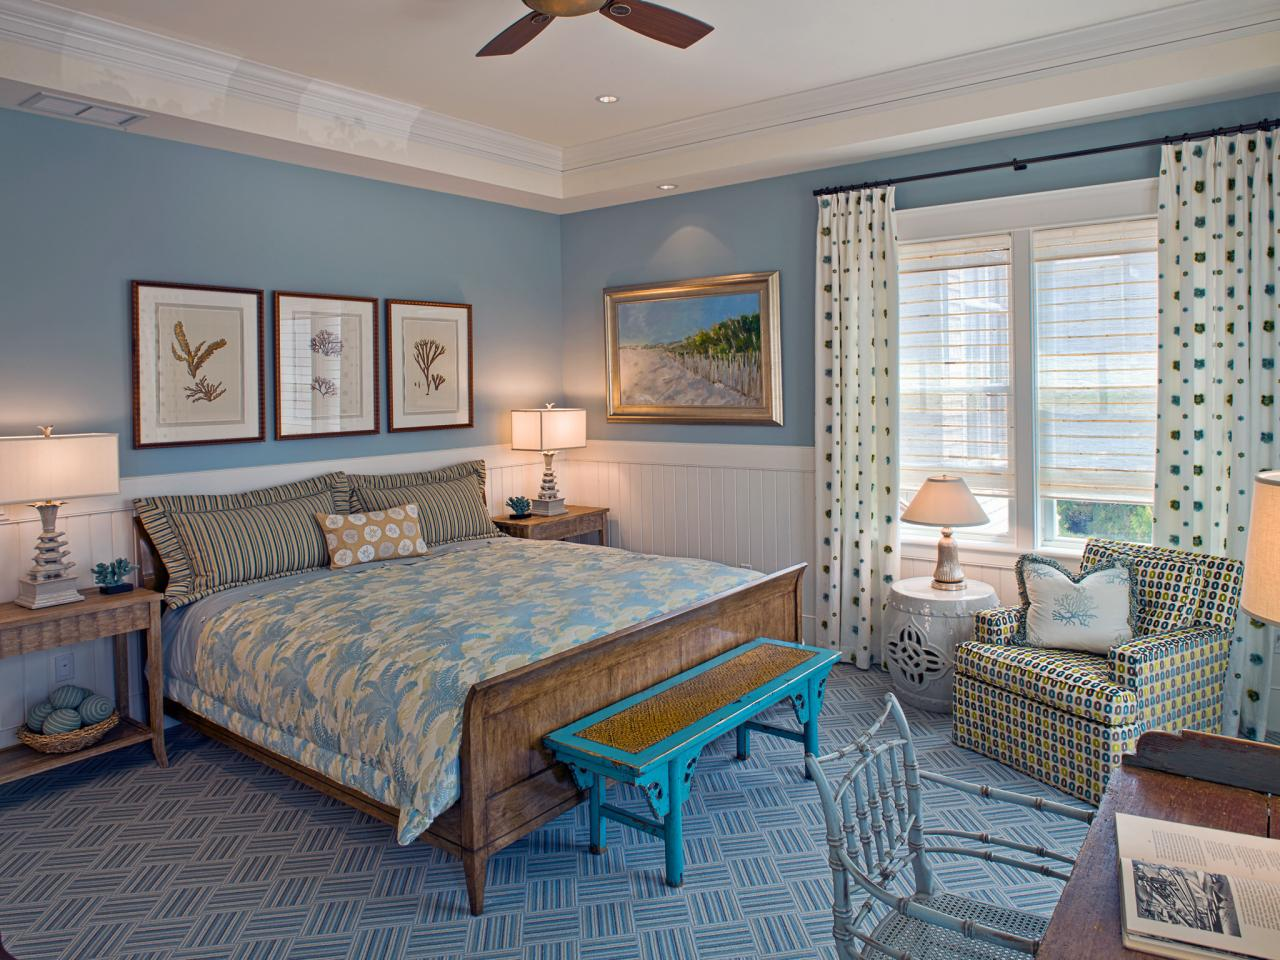 Bedroom Paint Color Ideas Fascinating Designer Wall Paint Colors  Jpeg